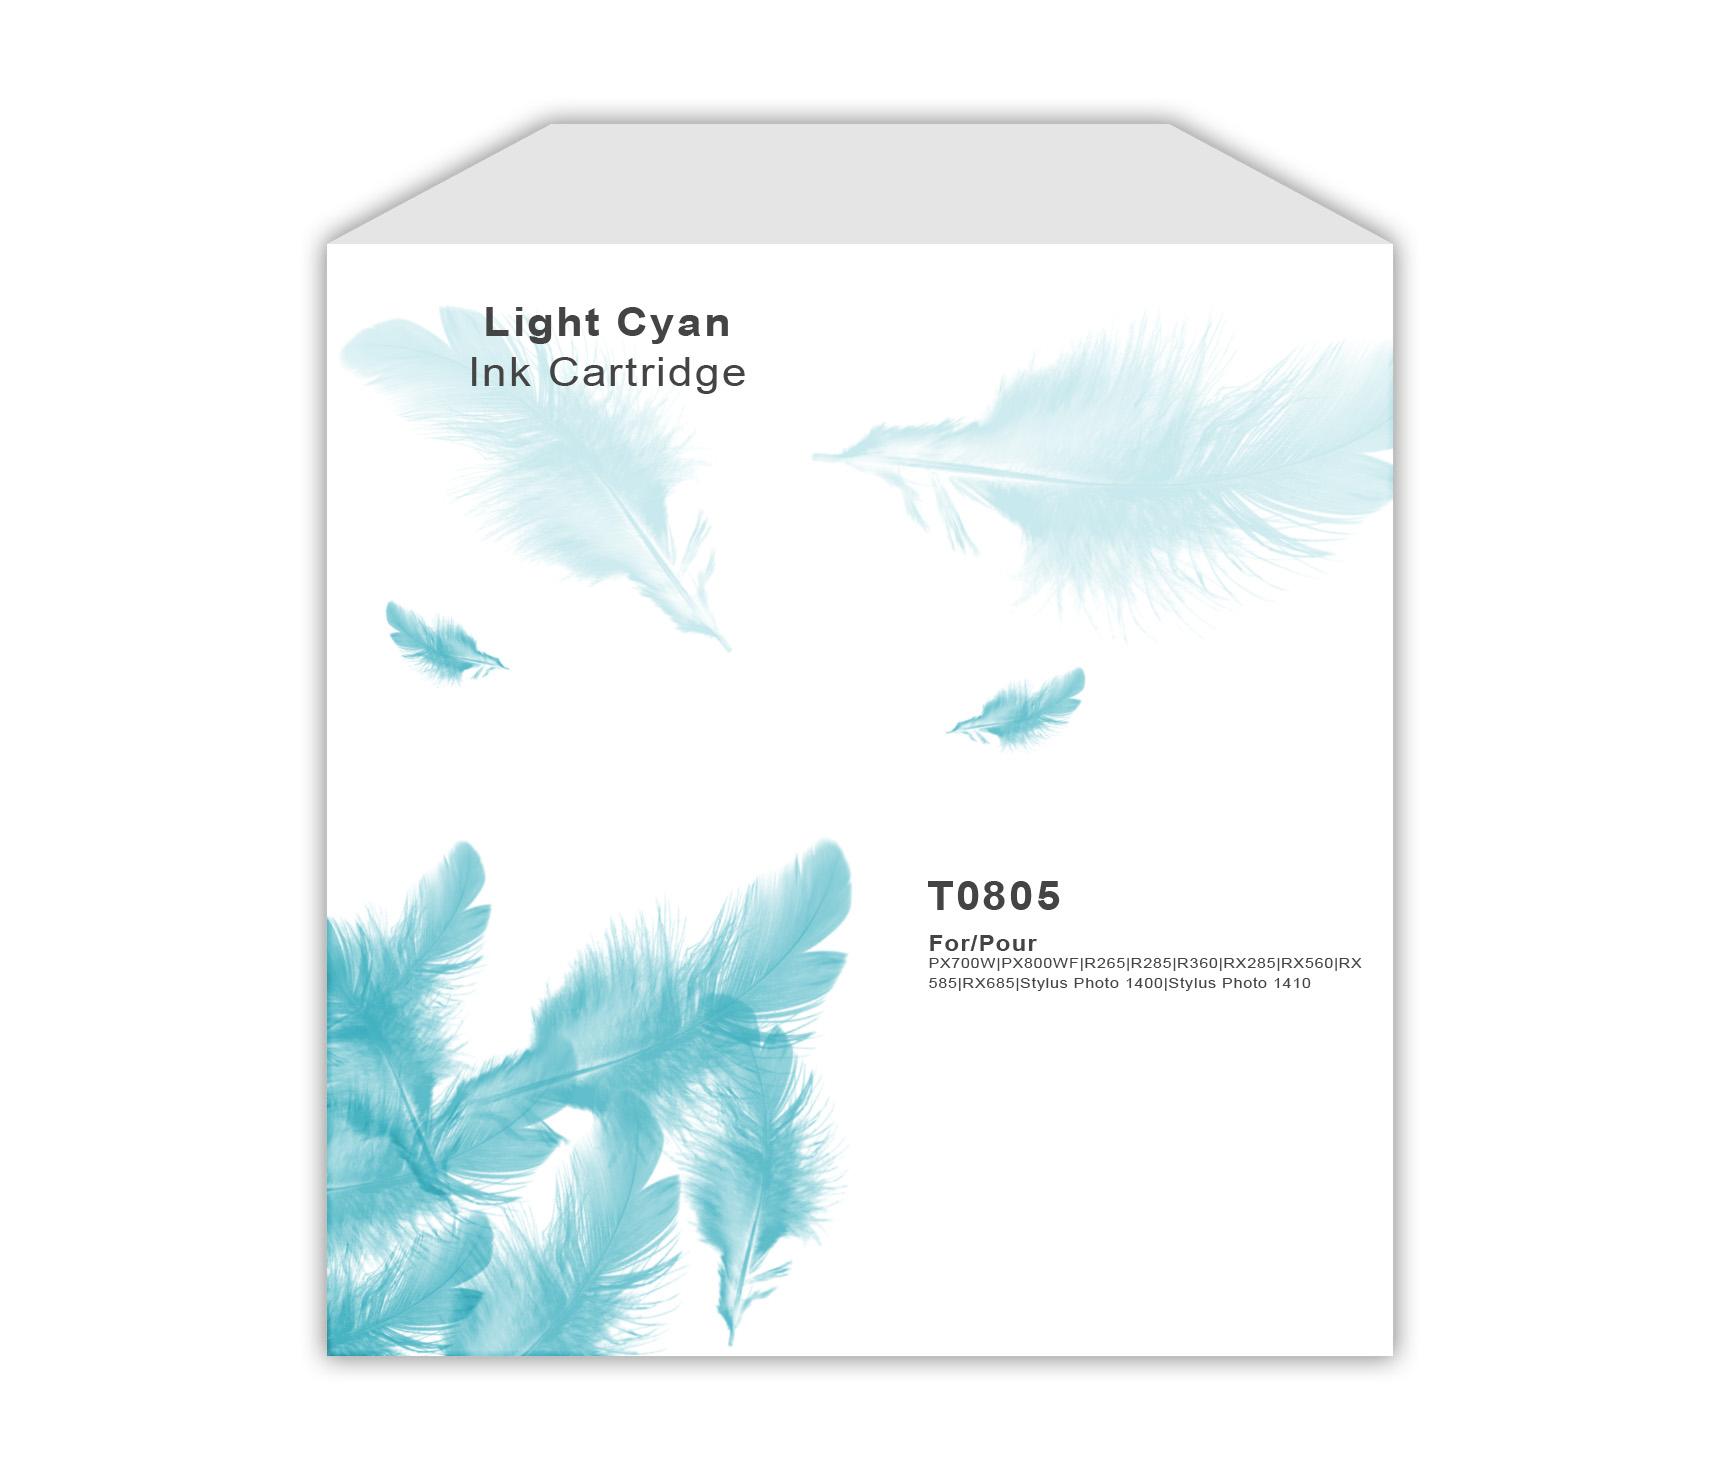 Epson TO805 Light Cyan Ink Cartrtidge